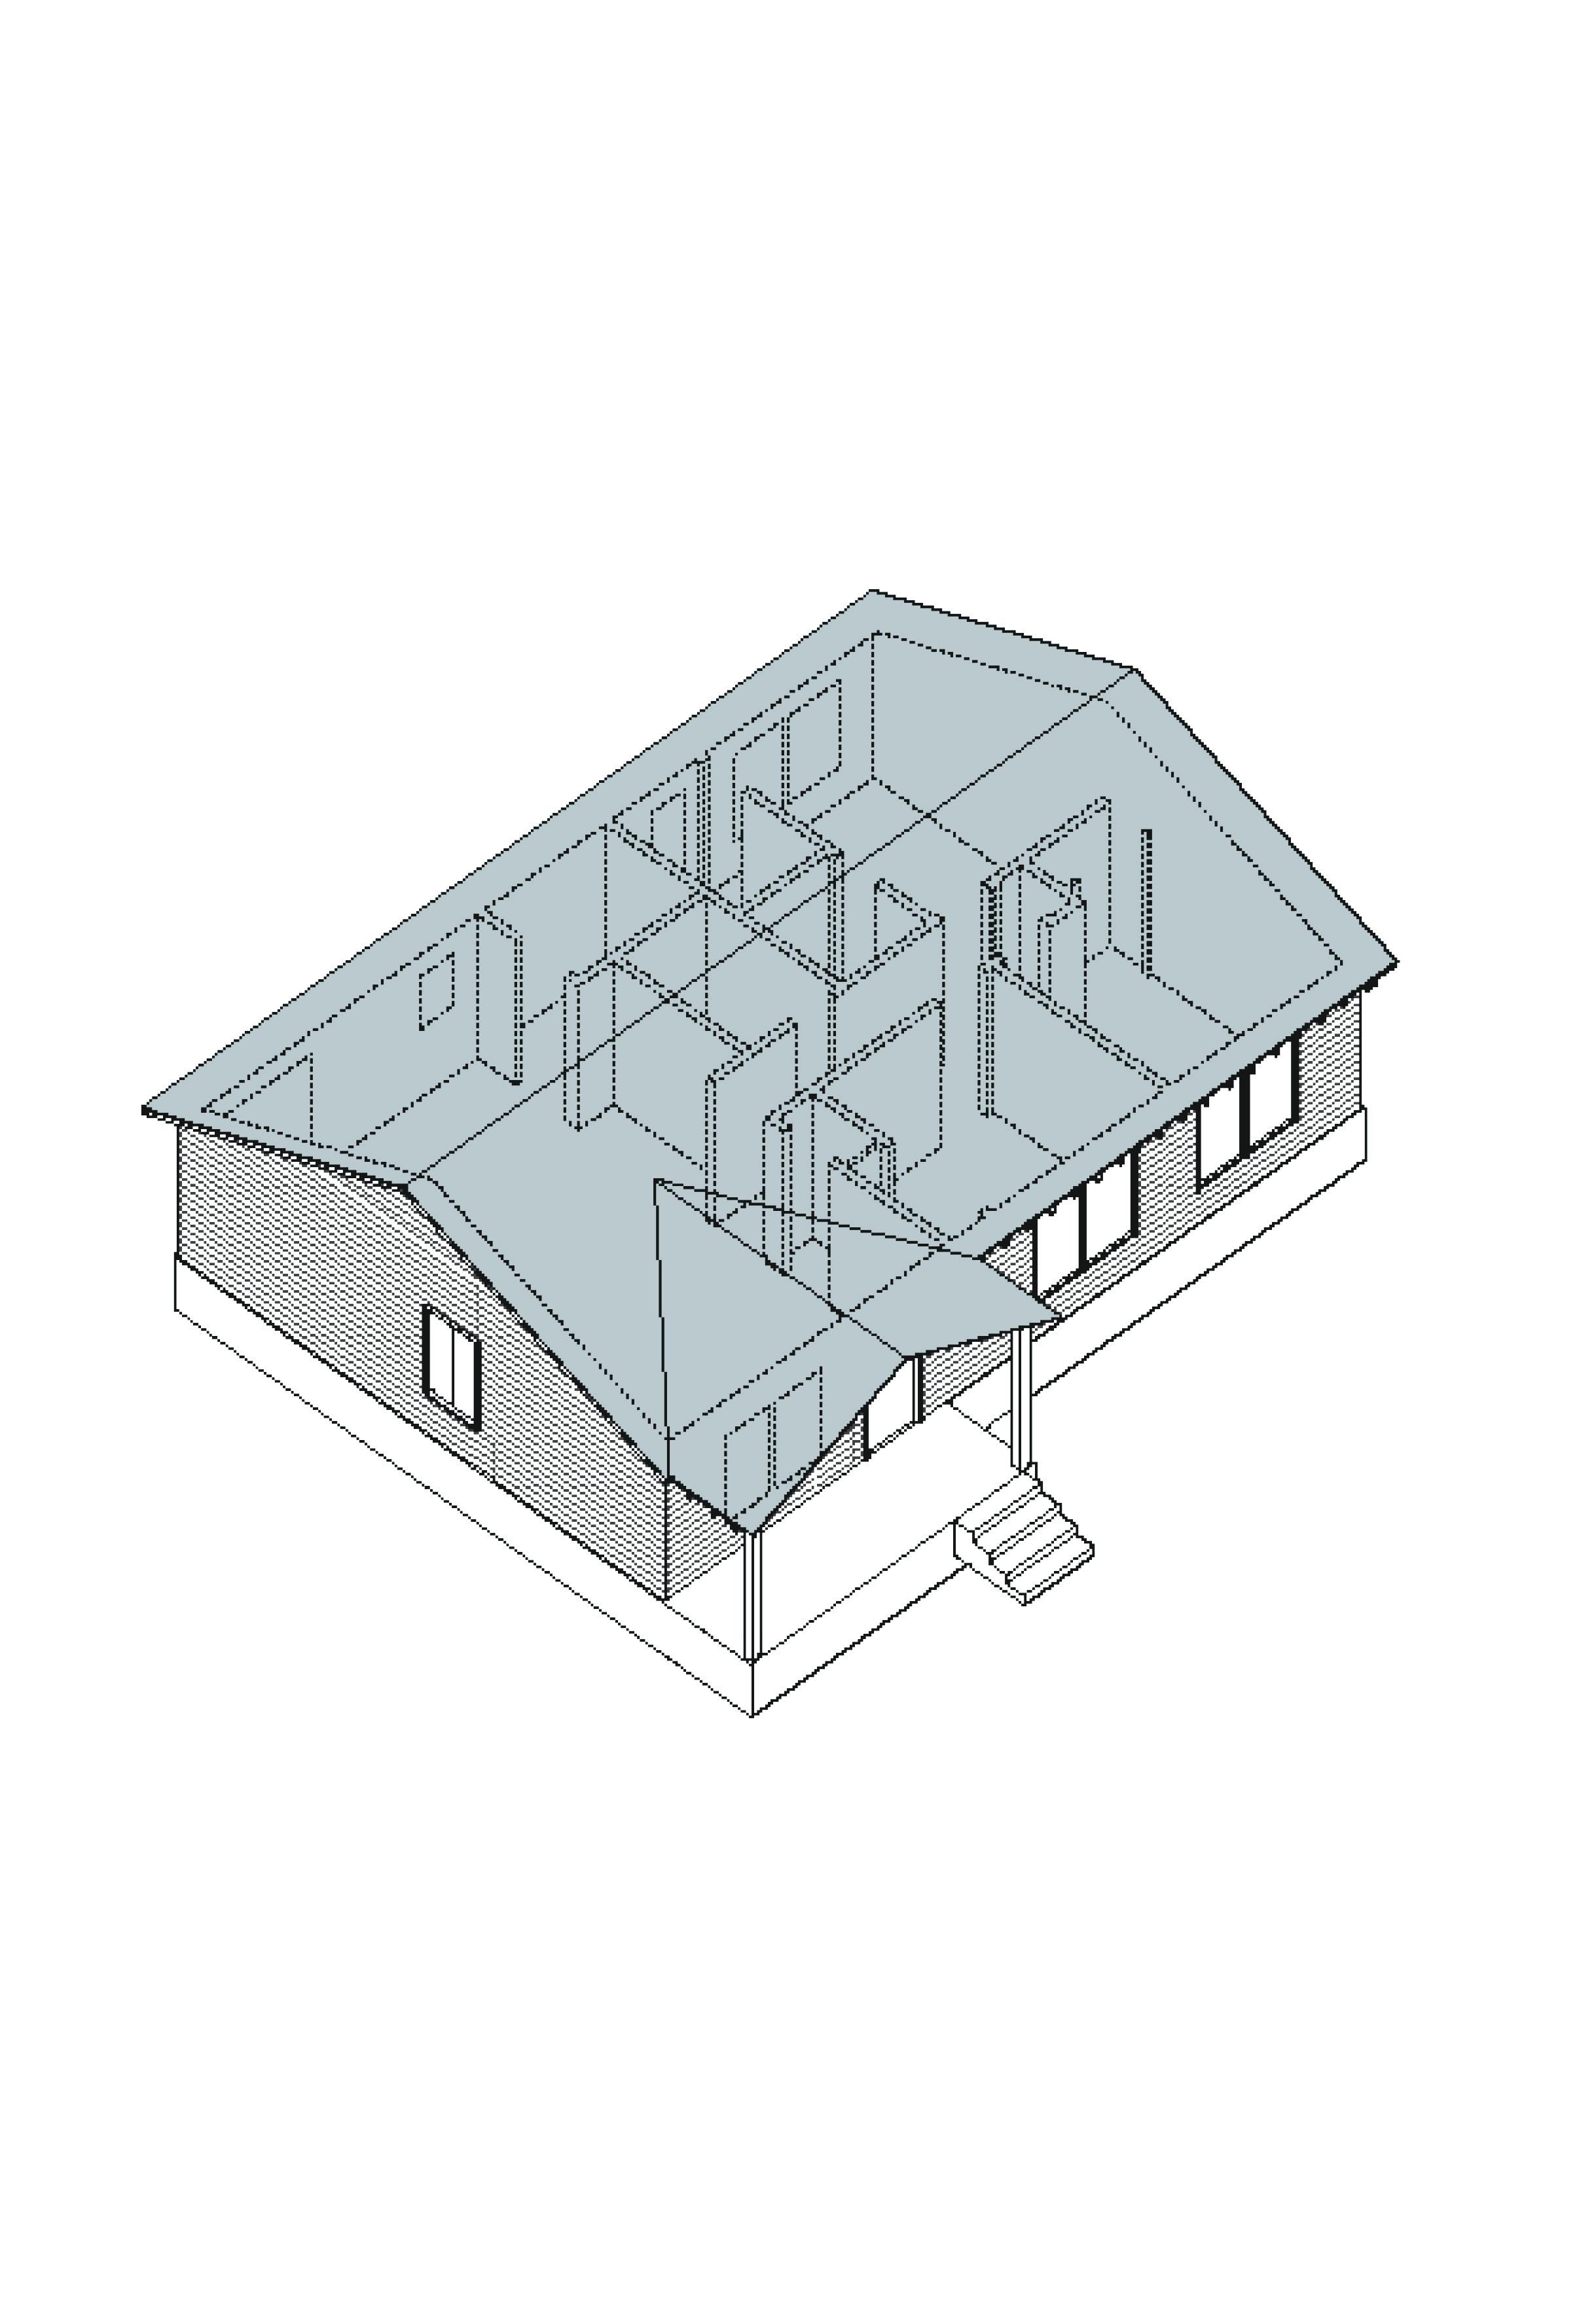 Picture of Axonometric Drawings II